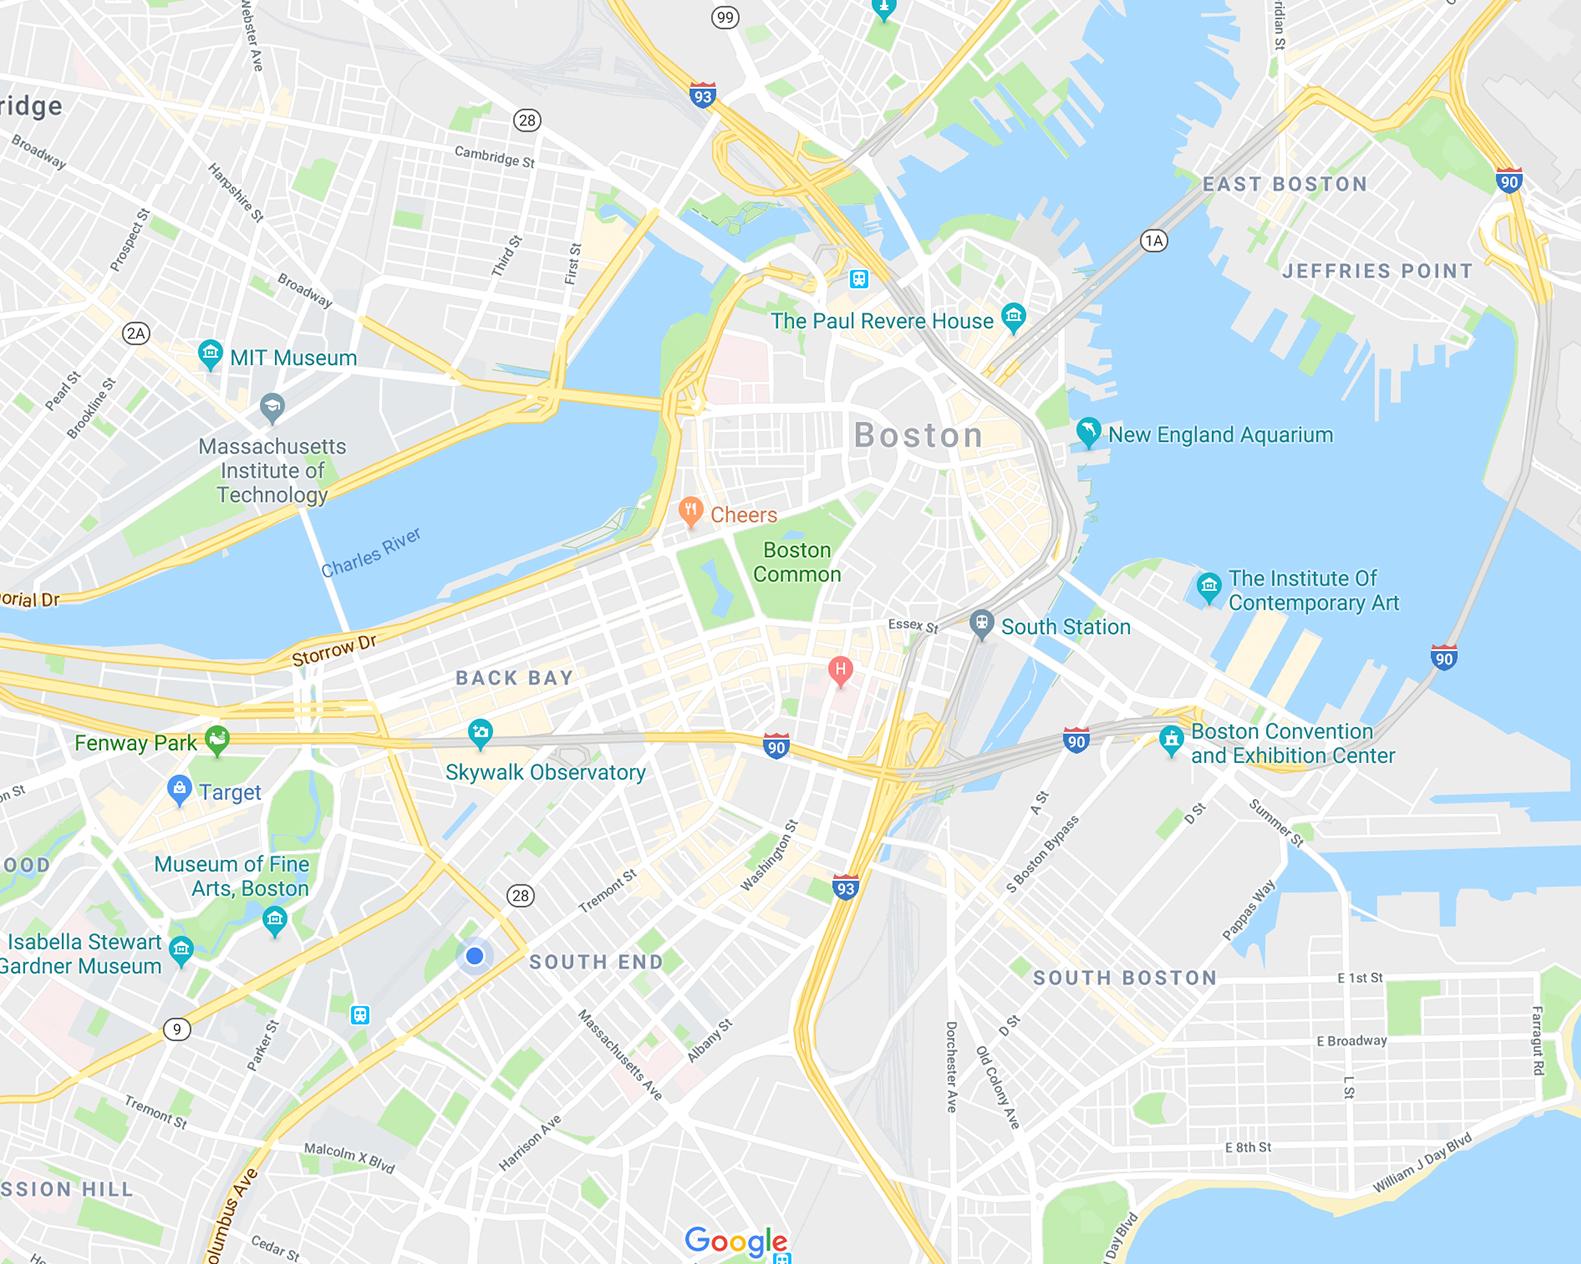 South End Tour Maps